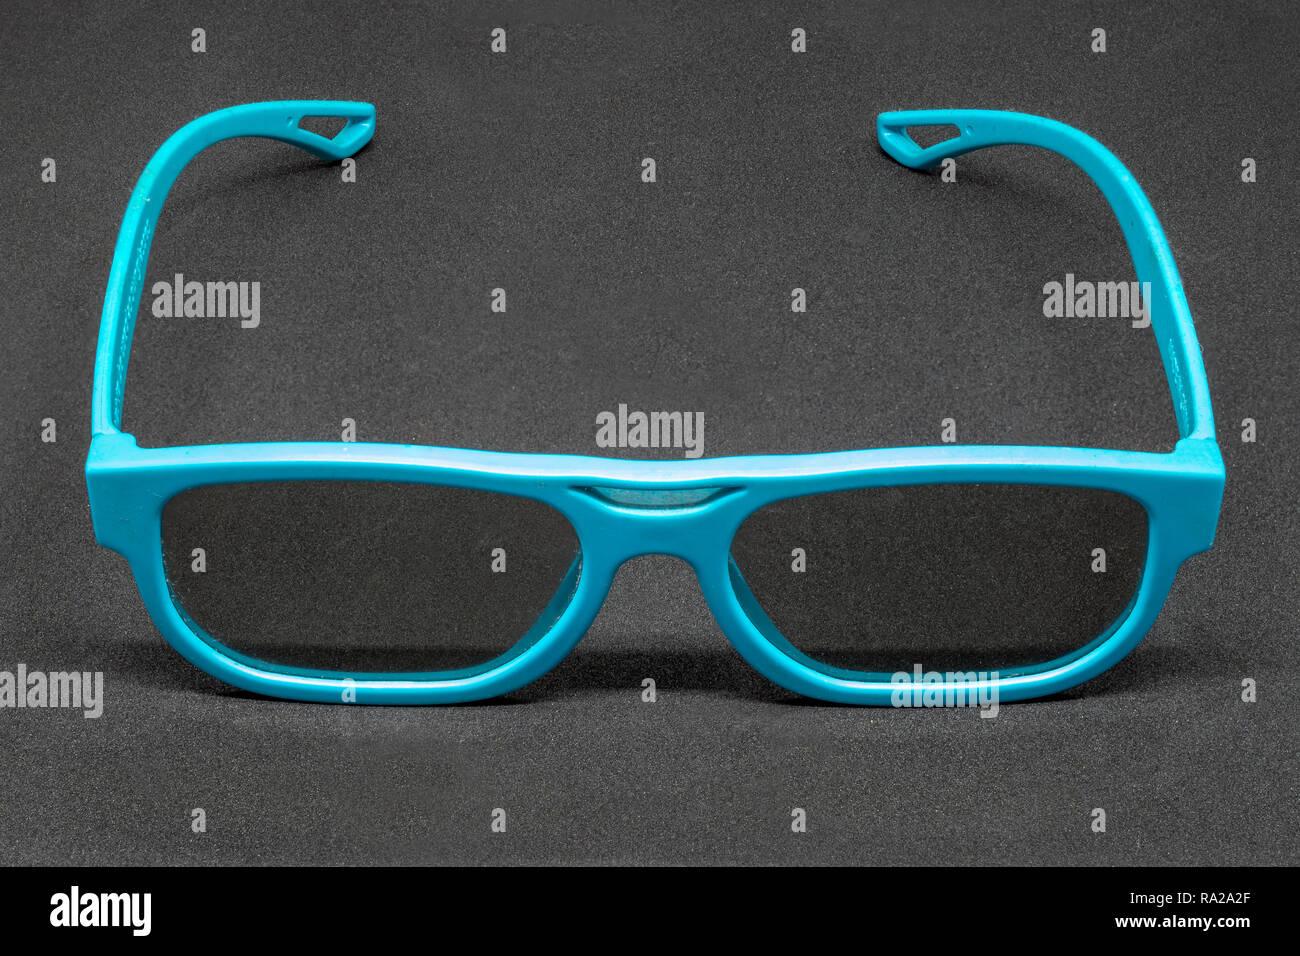 Light Blue 3 Dimensional glasses on a dark grey background - Stock Image